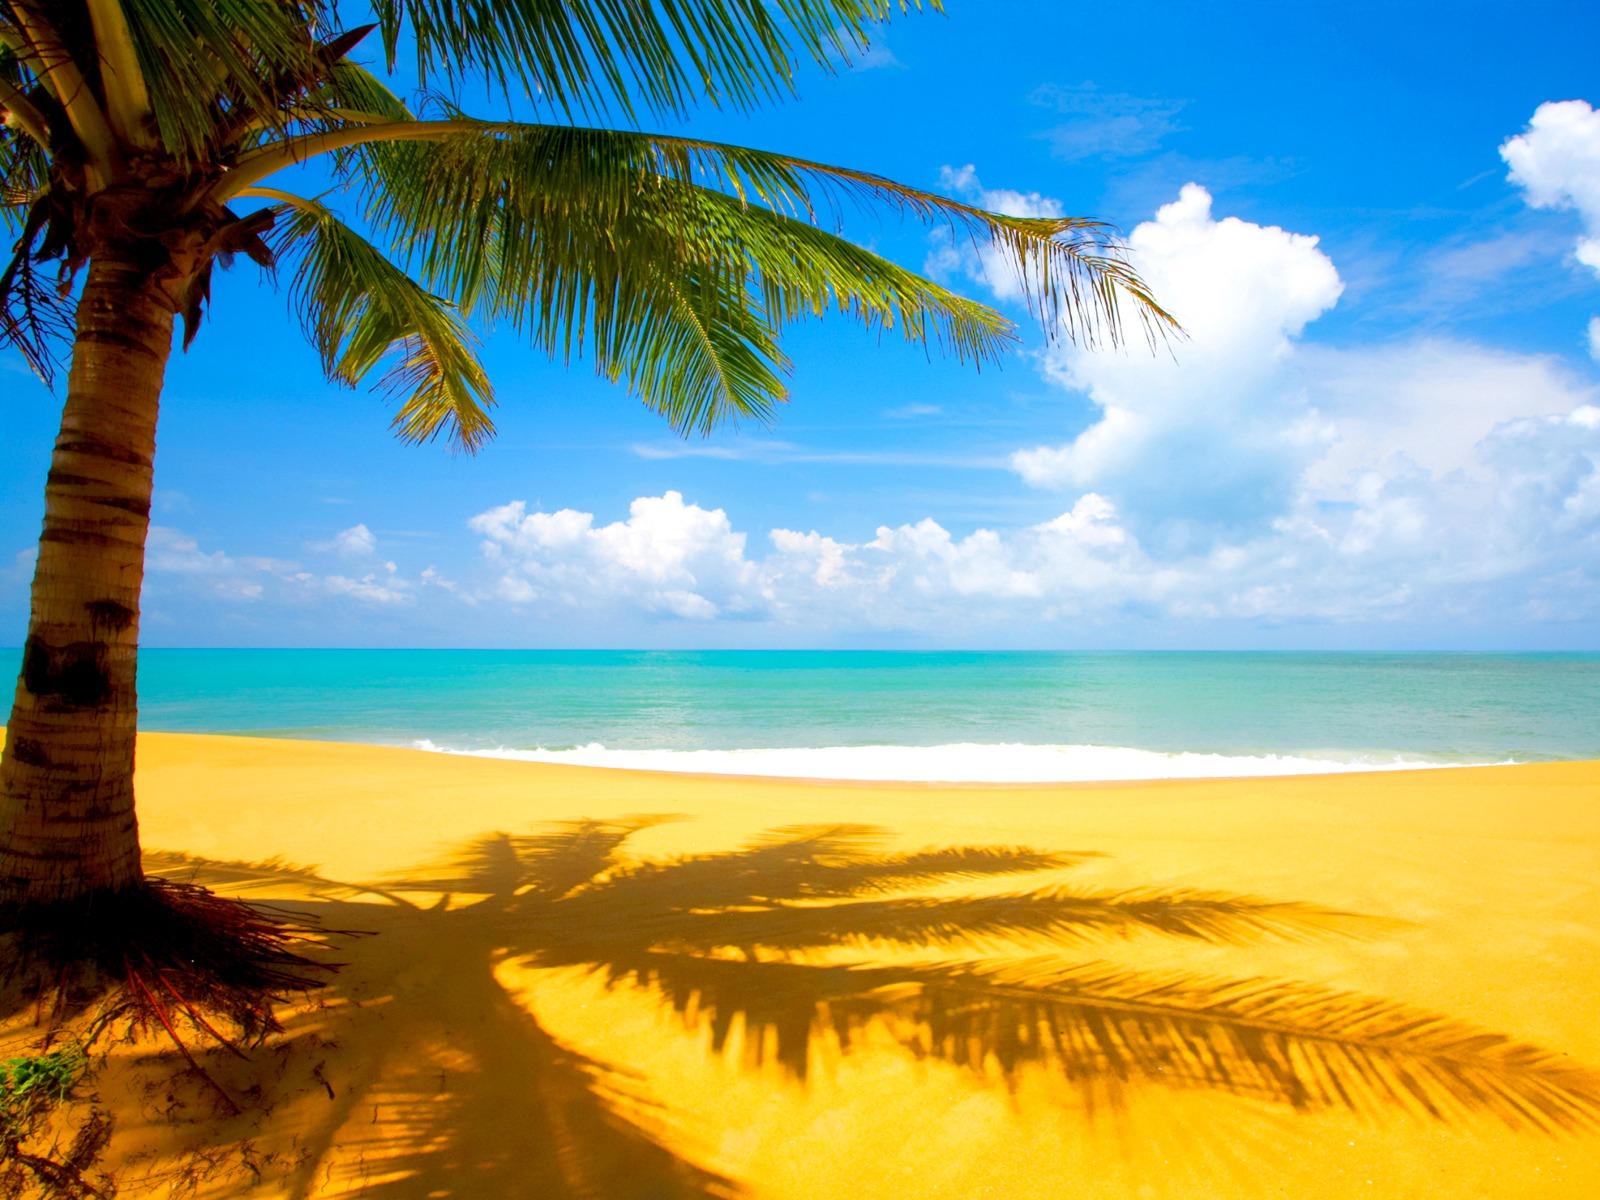 http://2.bp.blogspot.com/-MQ459CYTdVc/T8Xx-g4YHfI/AAAAAAAAAb4/I2CZWbS6GcA/s1600/Beach+Wallpaper+Photo.jpg